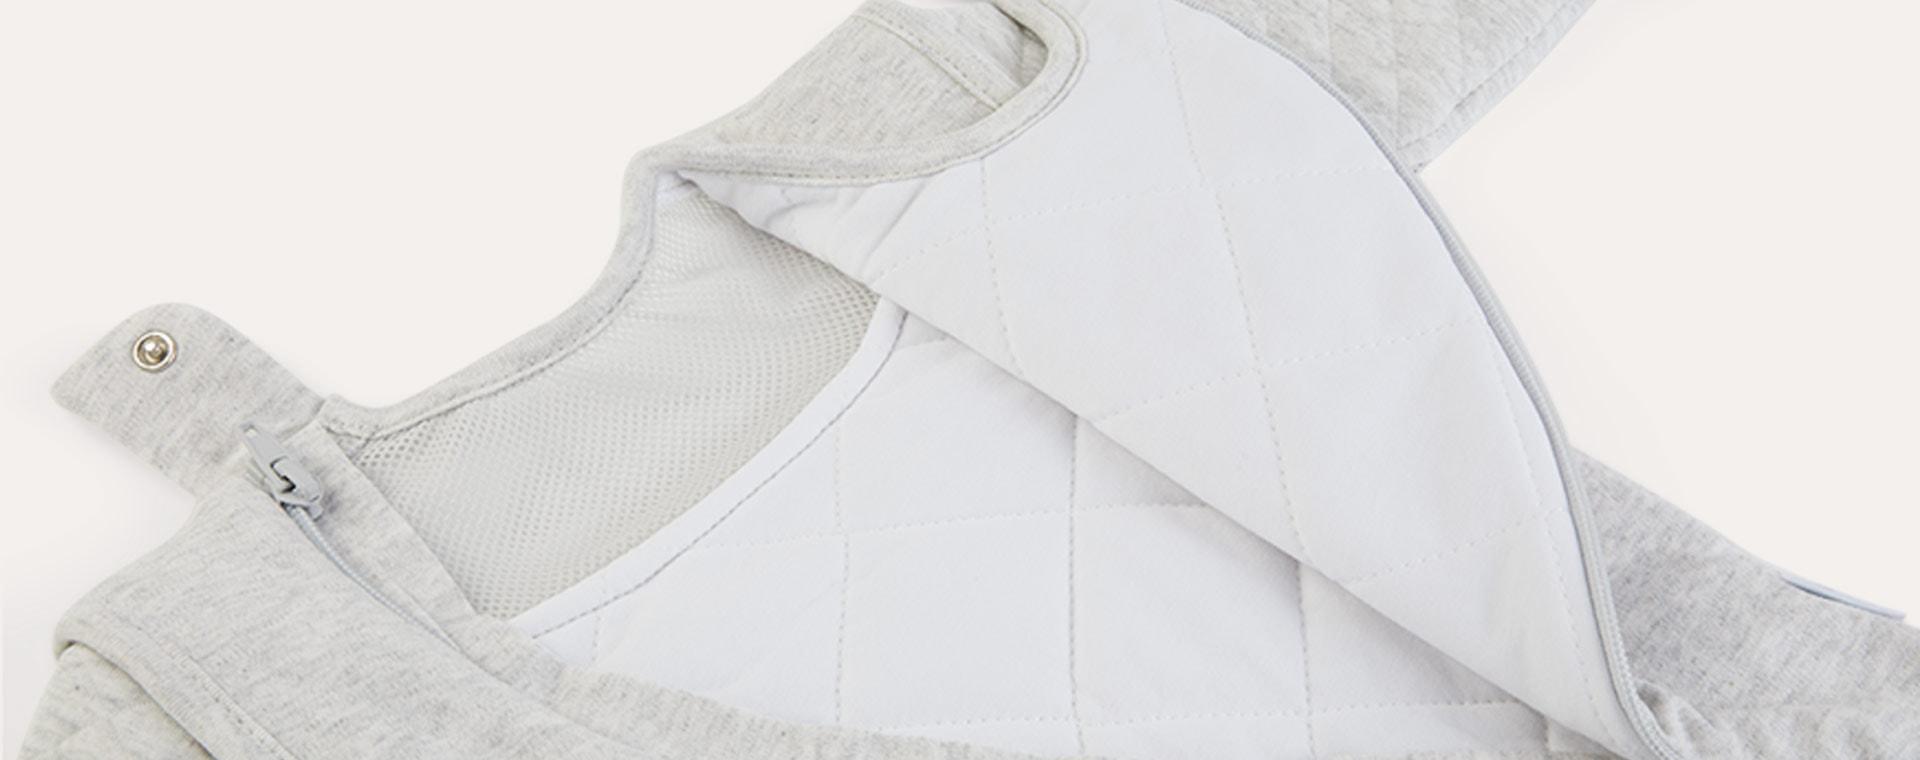 Minimal Grey PurFlo Baby Sleep Bag 2.5 Tog